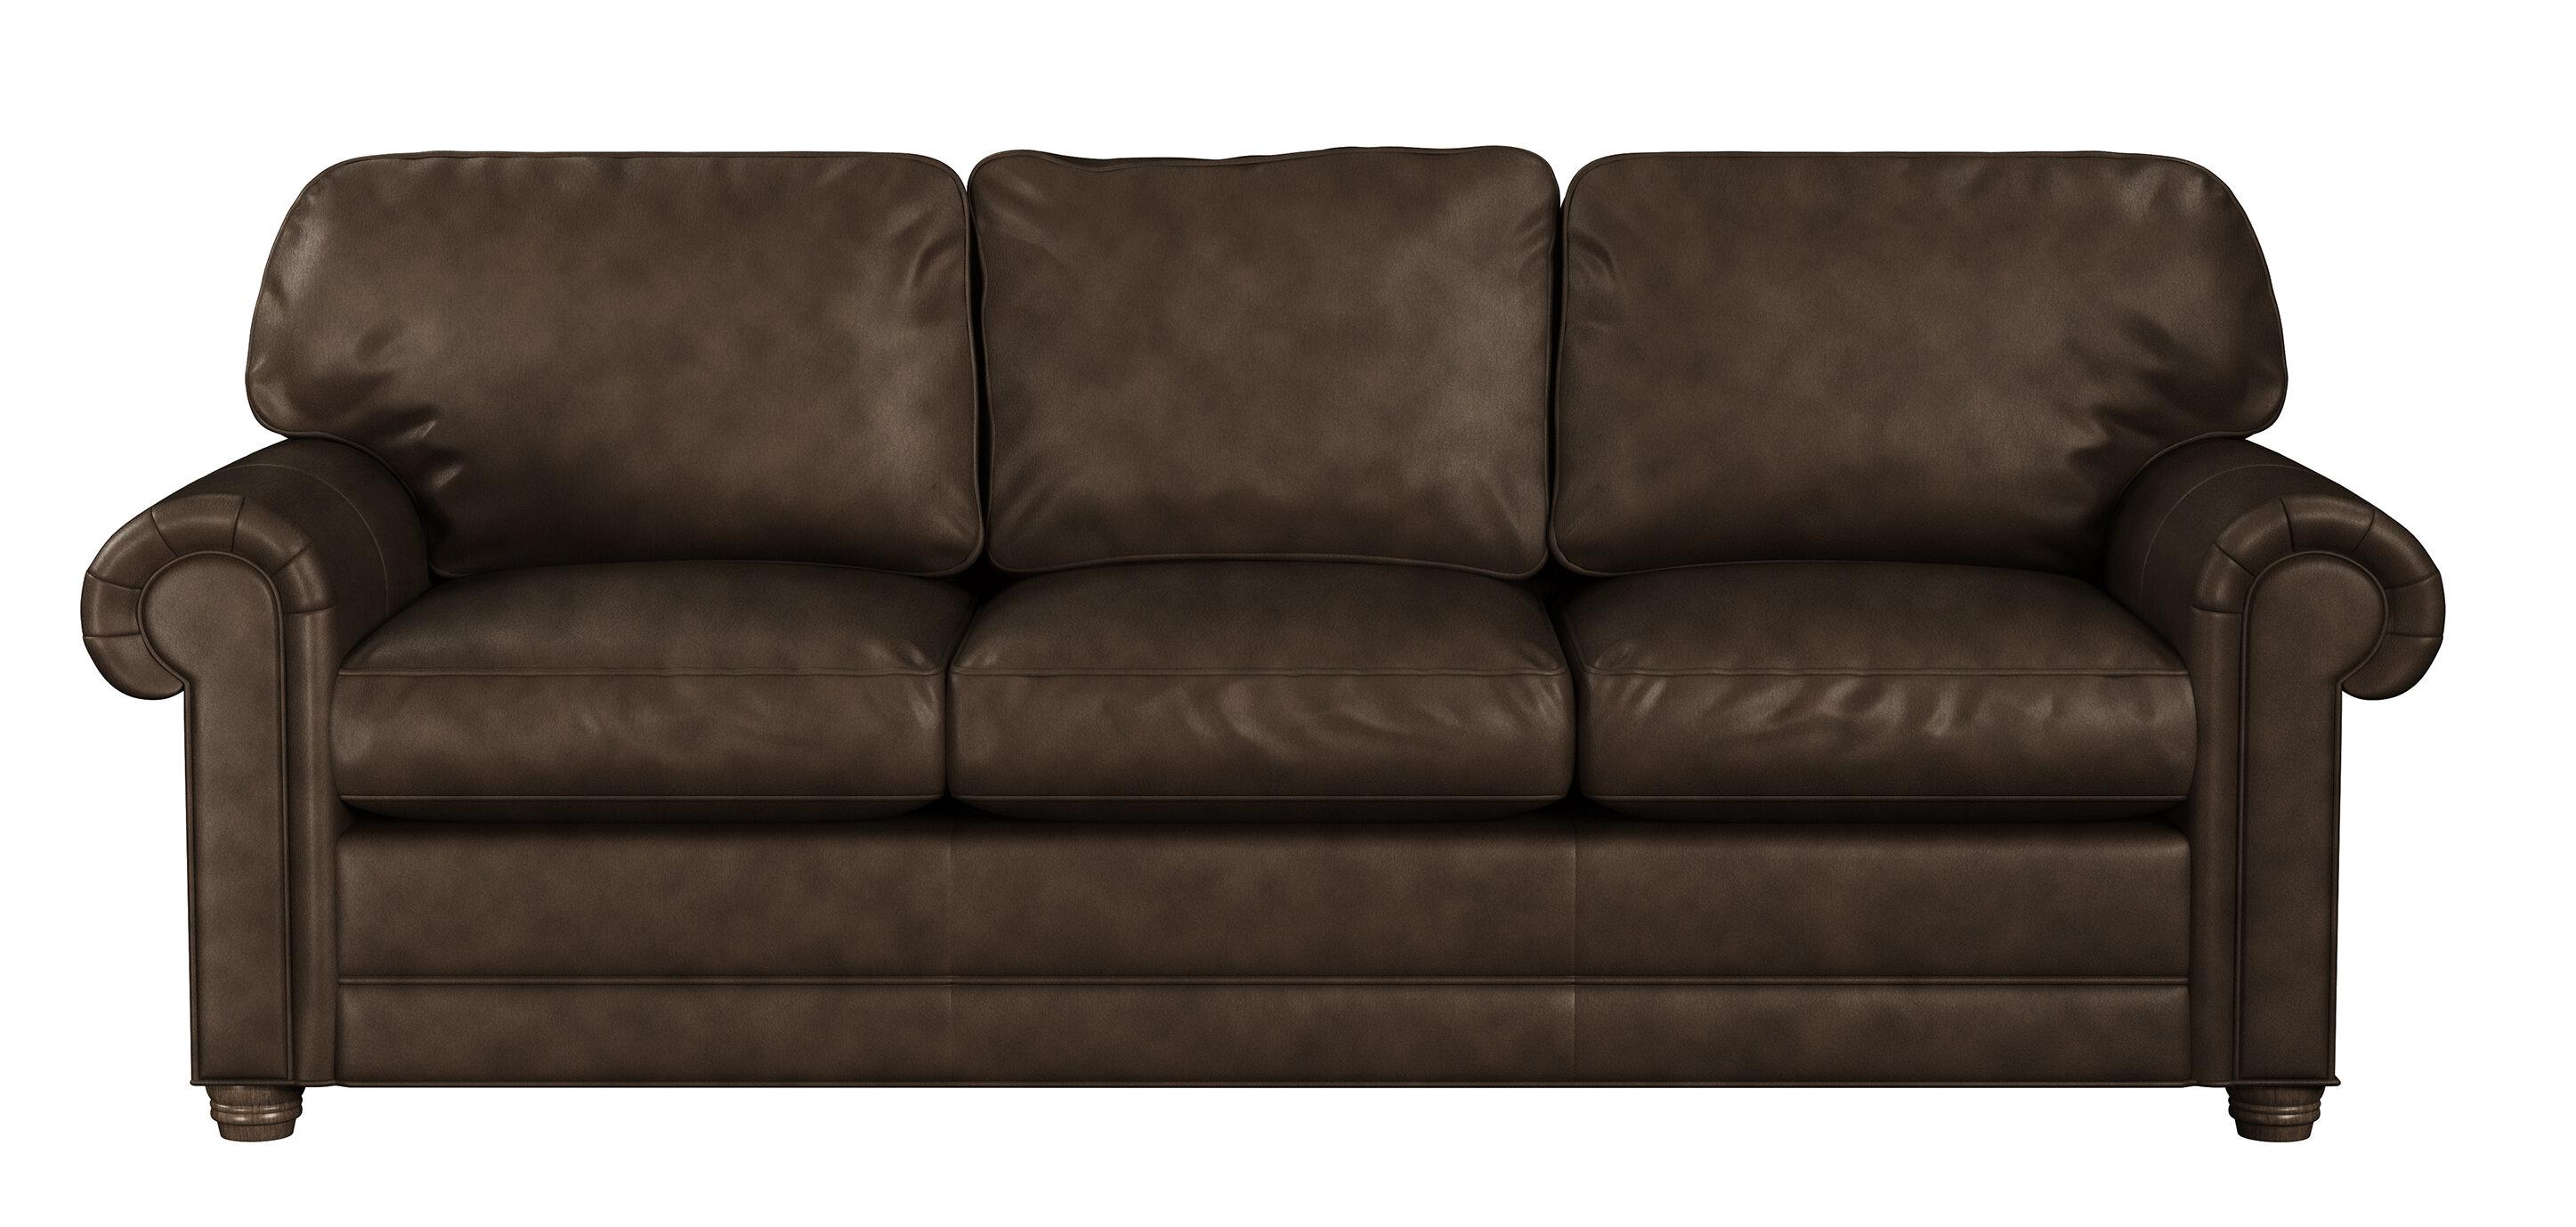 Westland And Birch Oslo 90 Wide Genuine Leather Rolled Arm Sleeper Sofa Bed Wayfair Ca